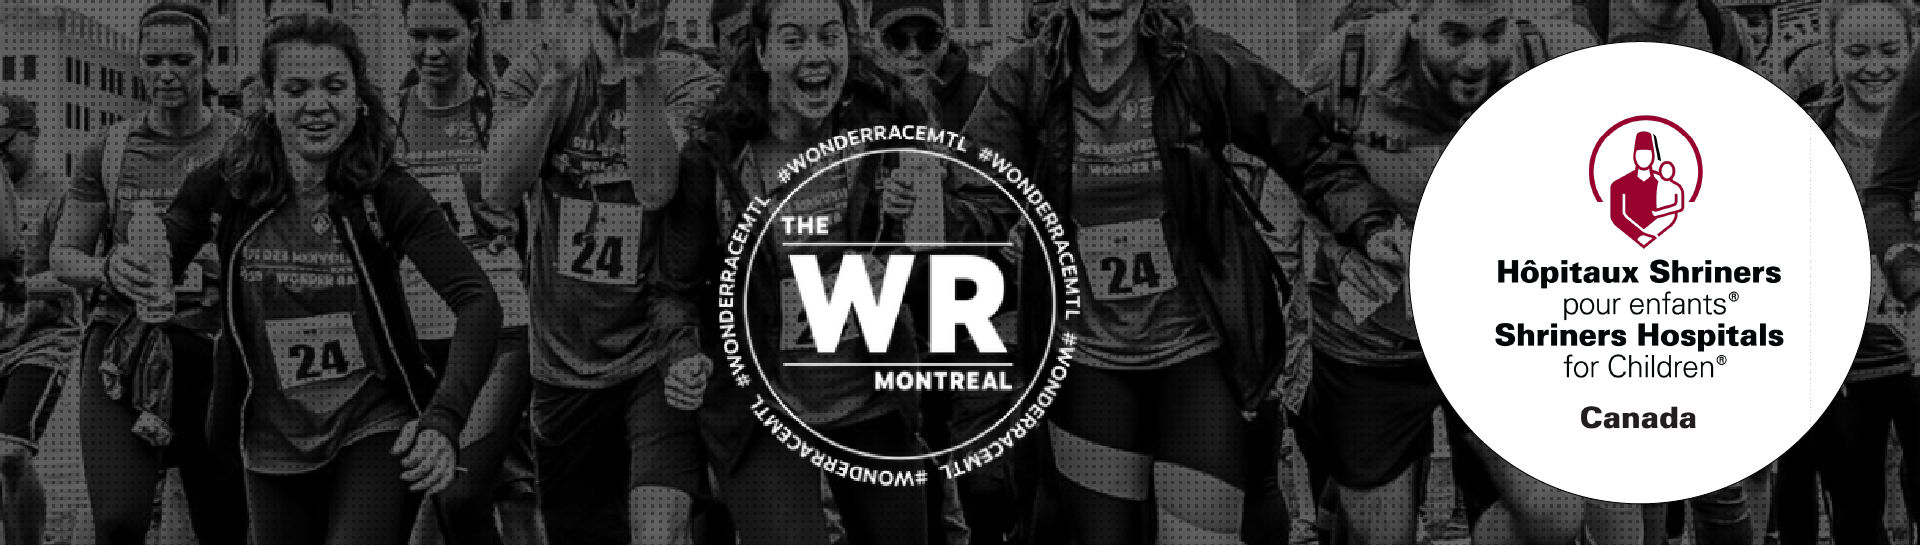 Wonder Race Banner Image with Logo